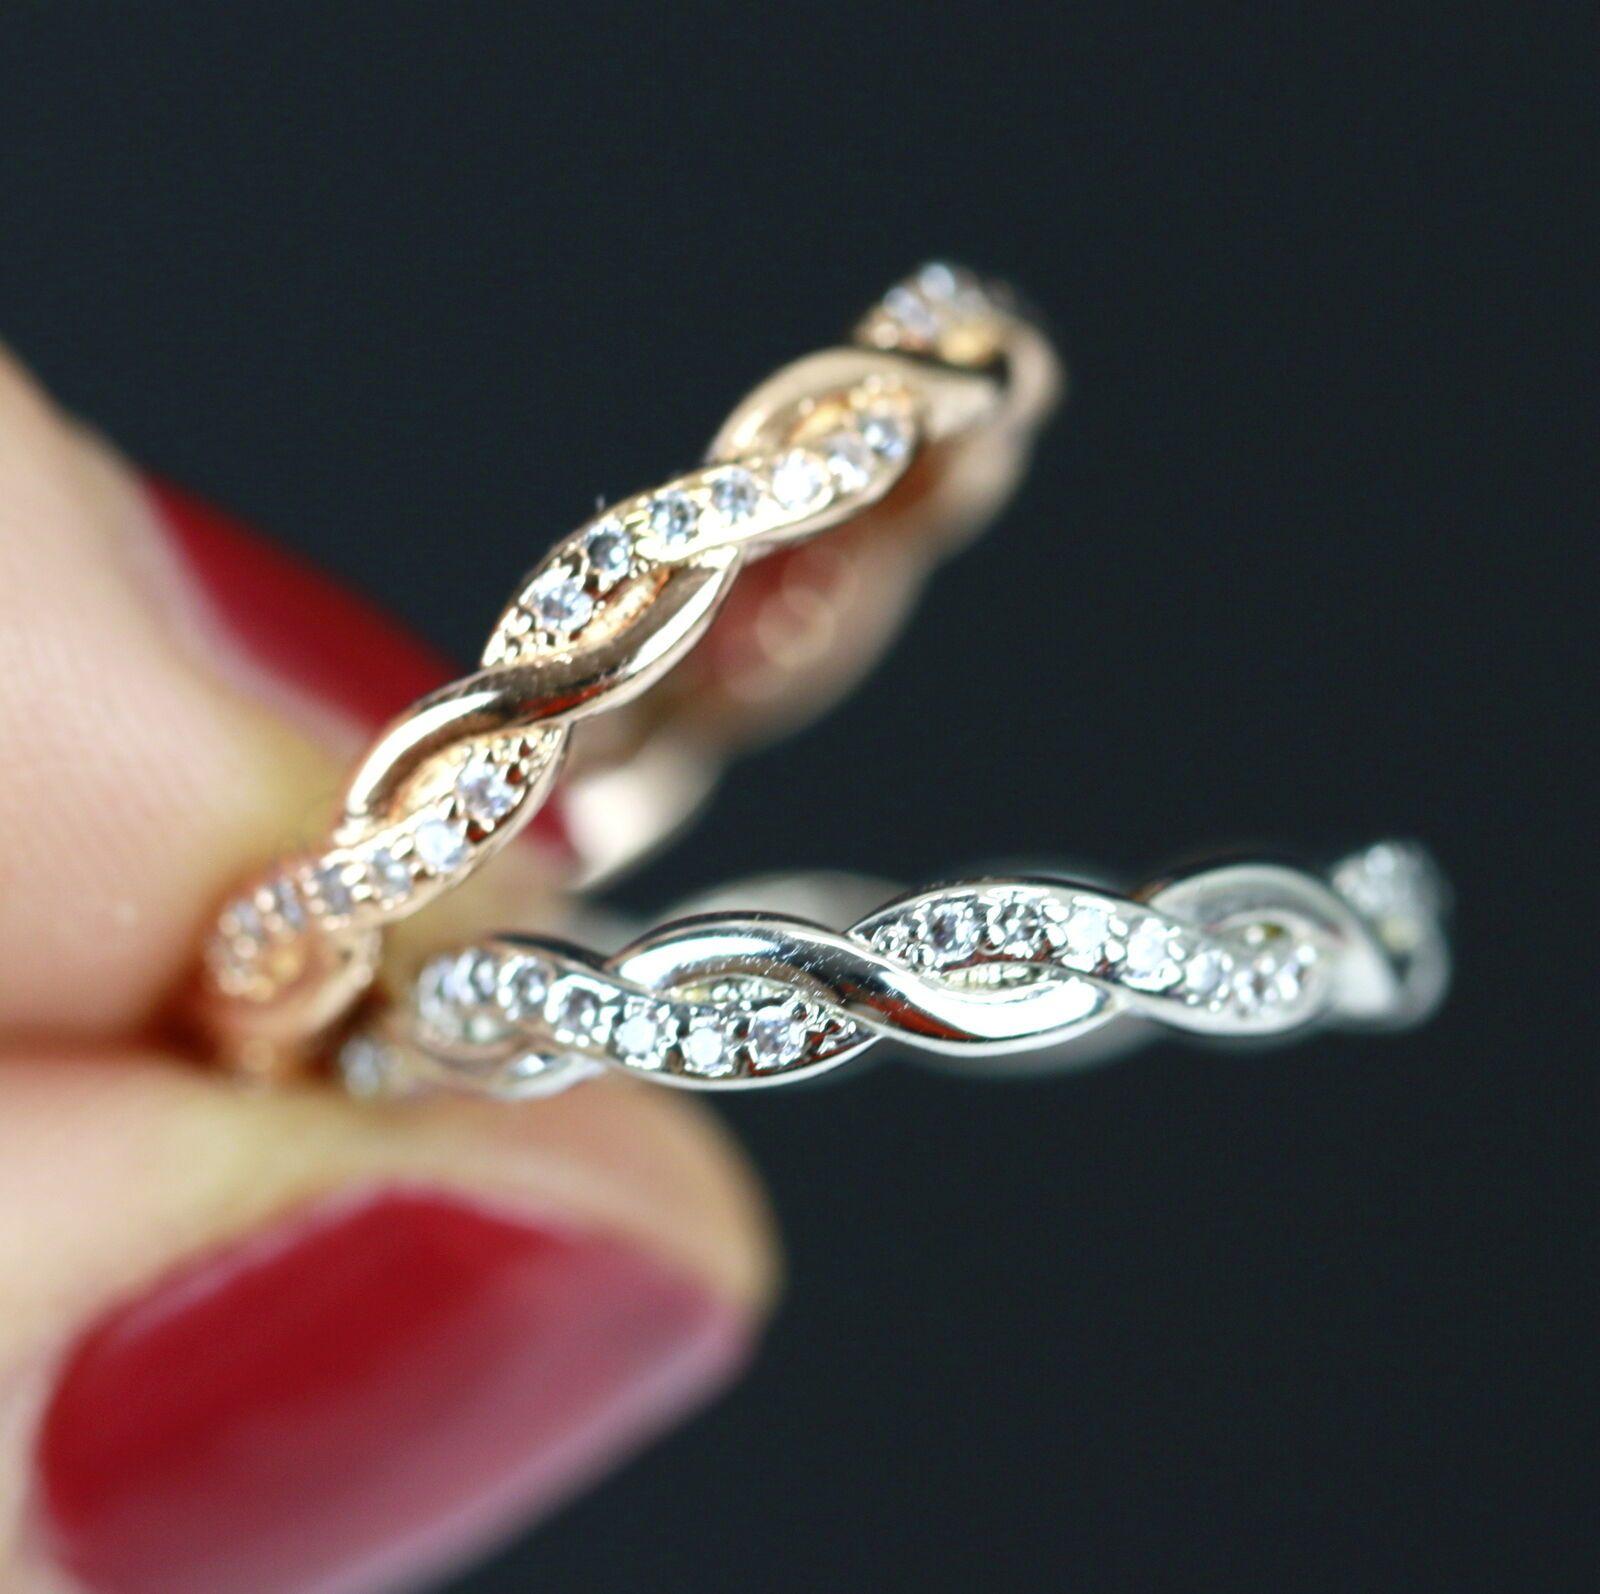 Paparazzi Fine Lines Black Dainty Ring Stretchy Dainty Rings Ideas Of Dainty Rings Daintyring Ring Jewelr In 2020 Wedding Rings Teardrop Dainty Band Dainty Ring